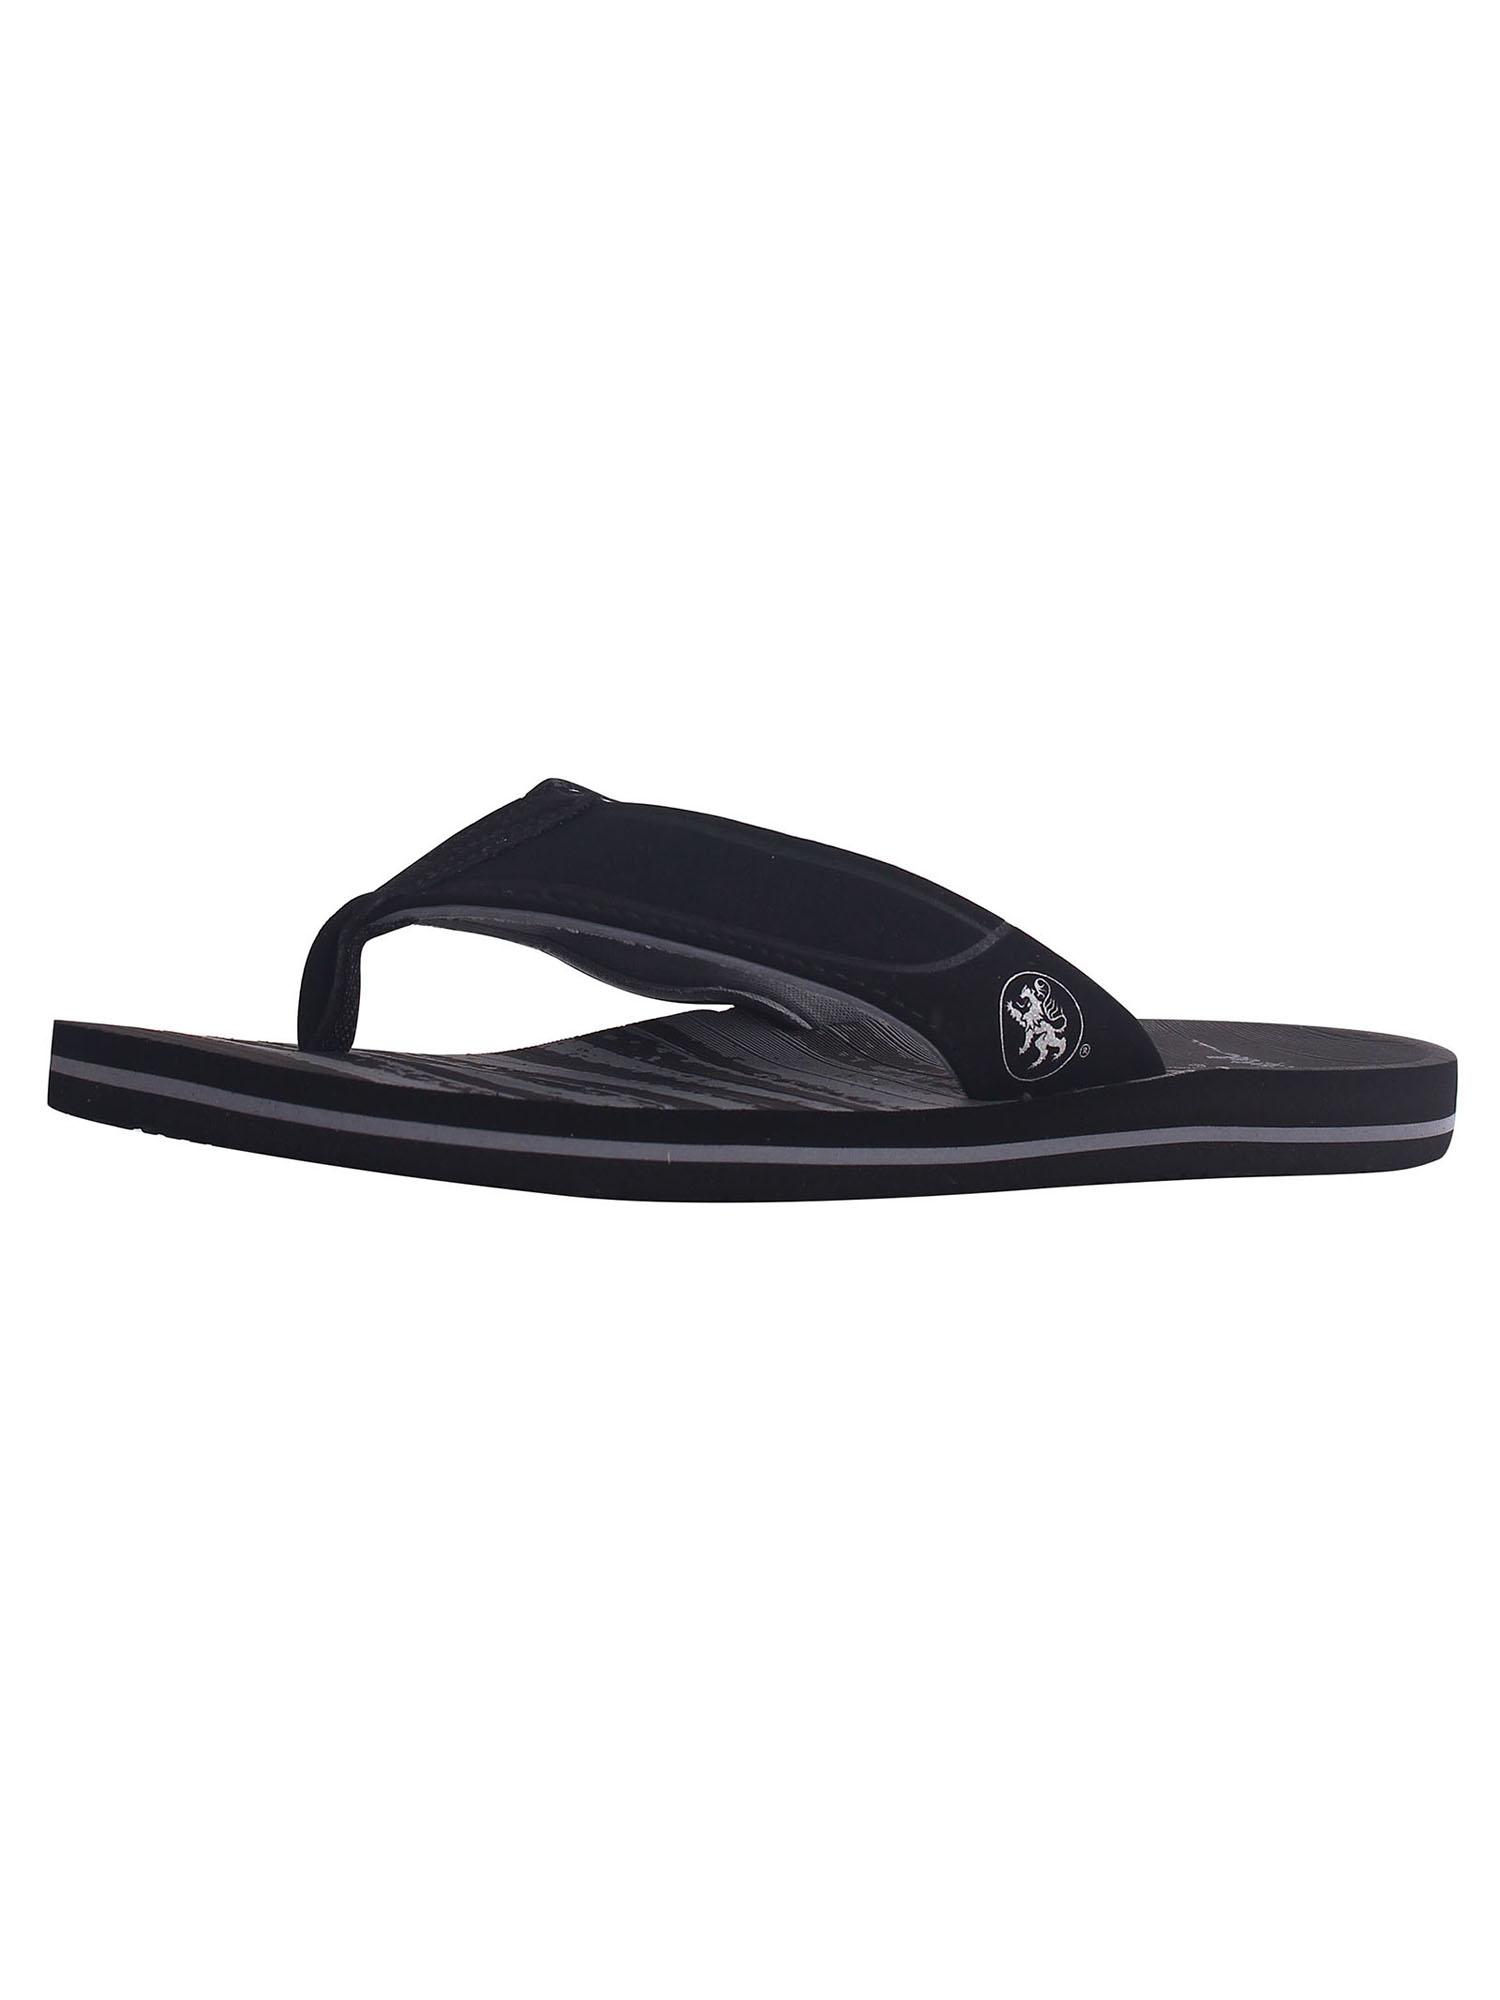 Men's Athletic Strap Poolside Casual Beach Flip Flop Sandals, Black/Grey, 10